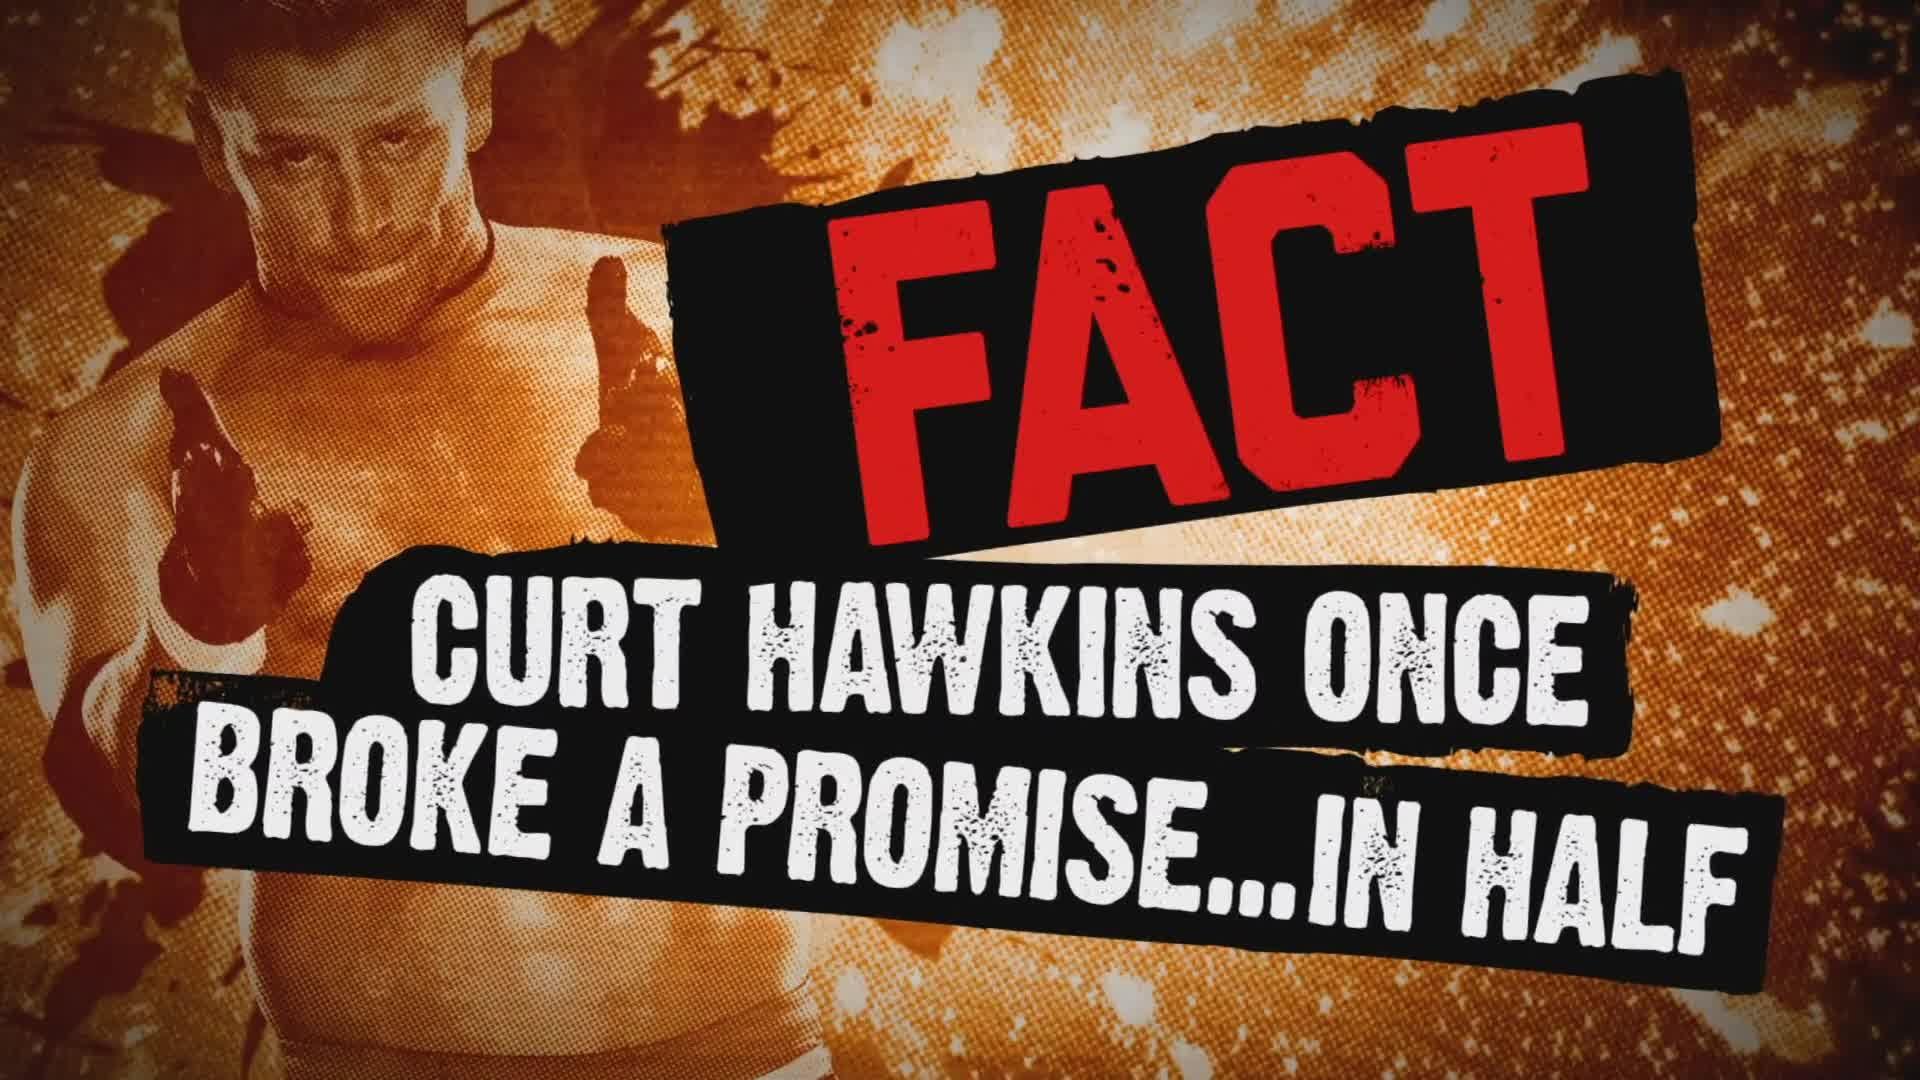 curt-hawkins